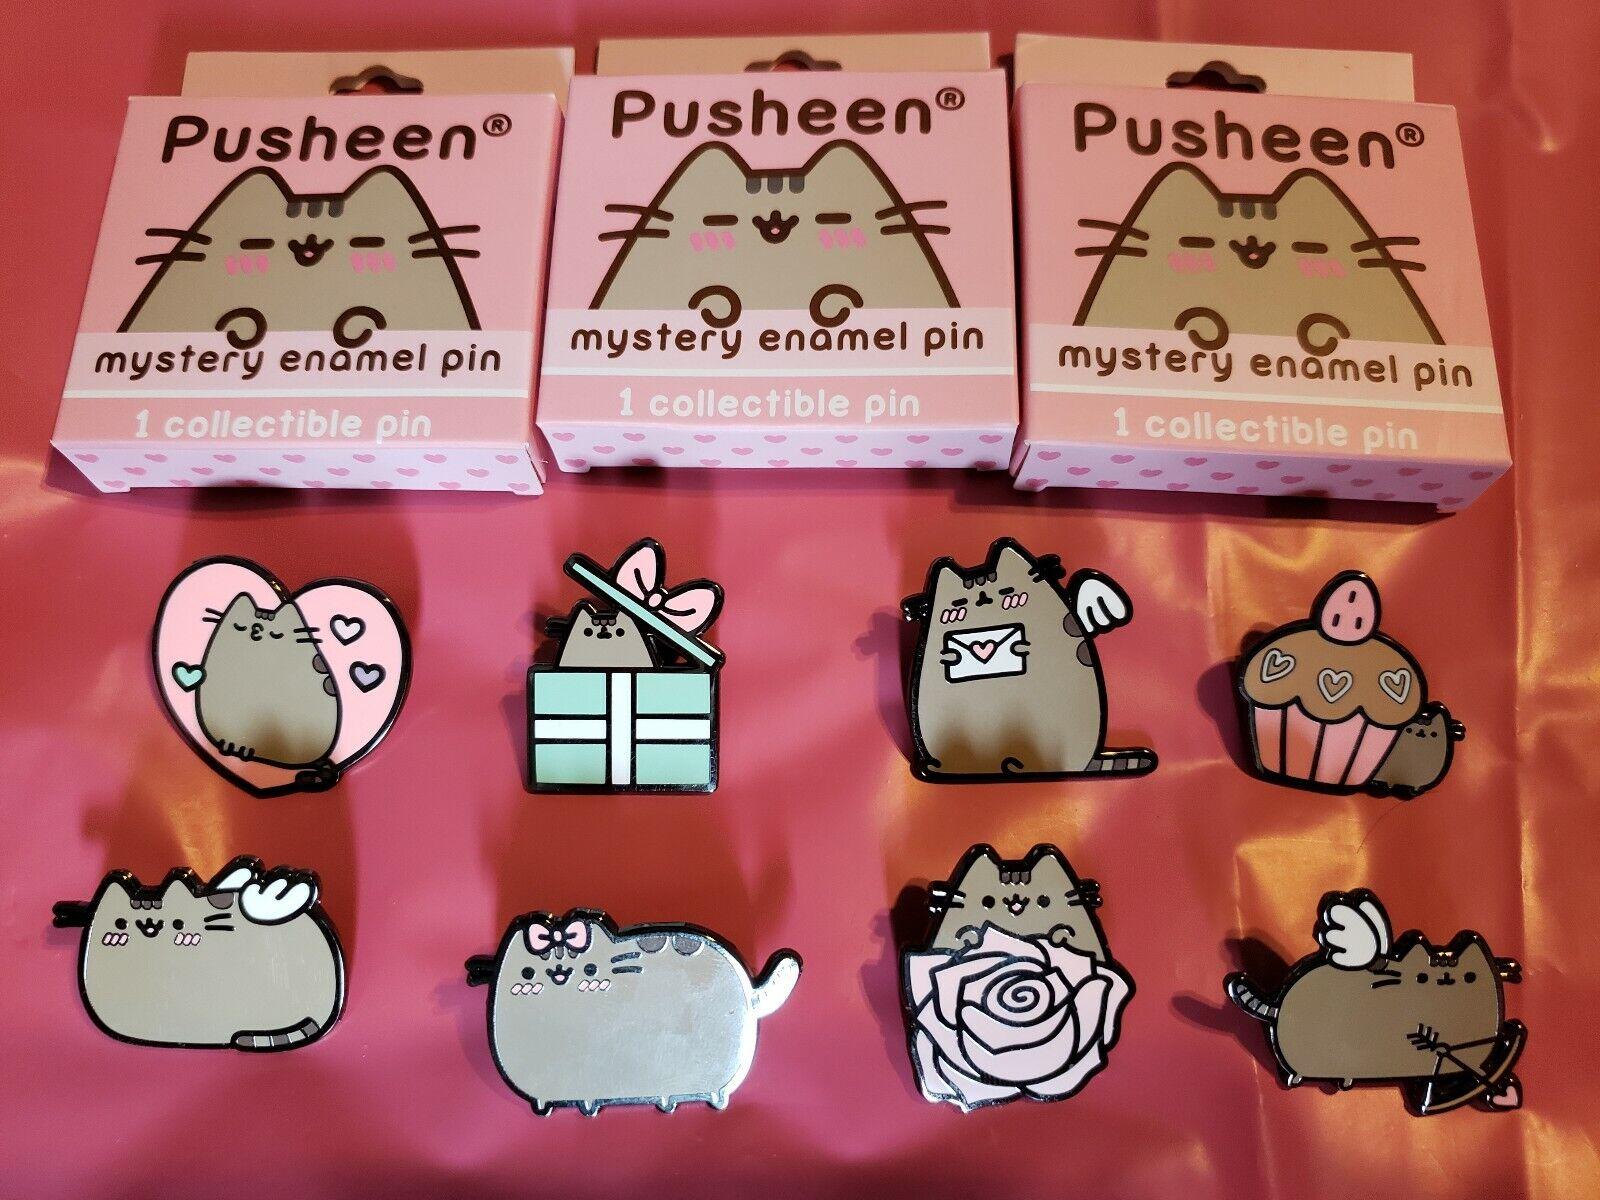 Pusheen Full set set of 8 Mystery Enamel Pins Valentines day.